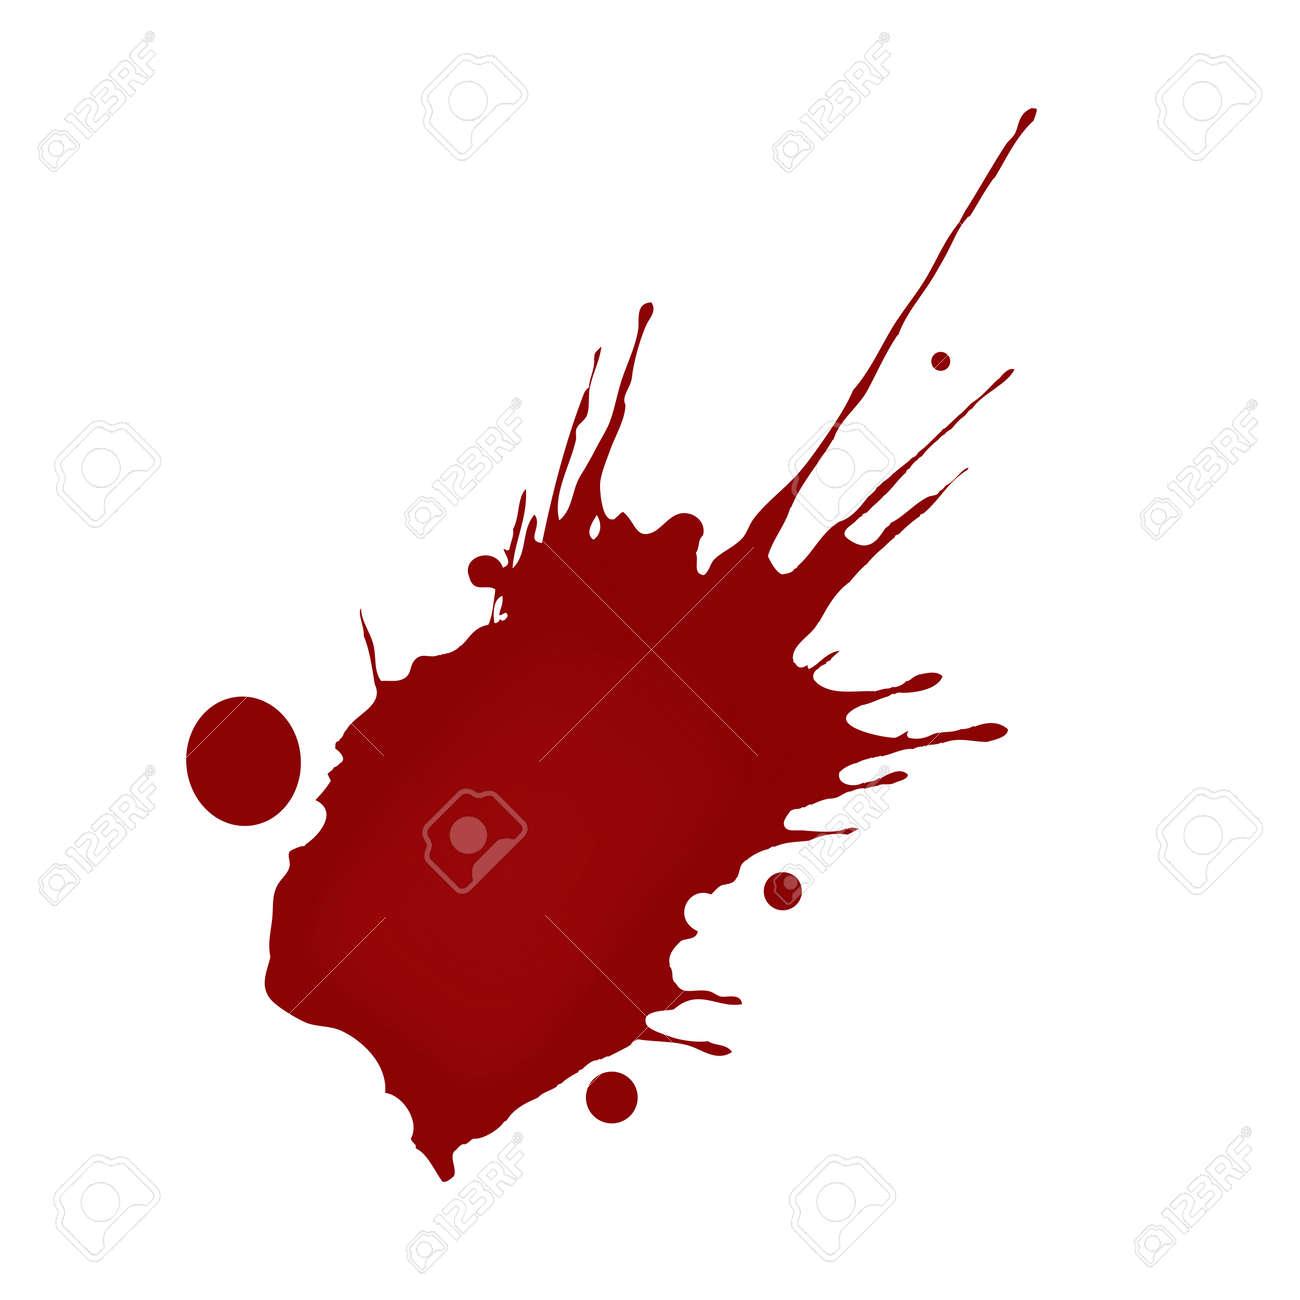 realistic blood splatters royalty free cliparts vectors and stock rh 123rf com blood splatter vector illustrator blood splatter vector illustrator